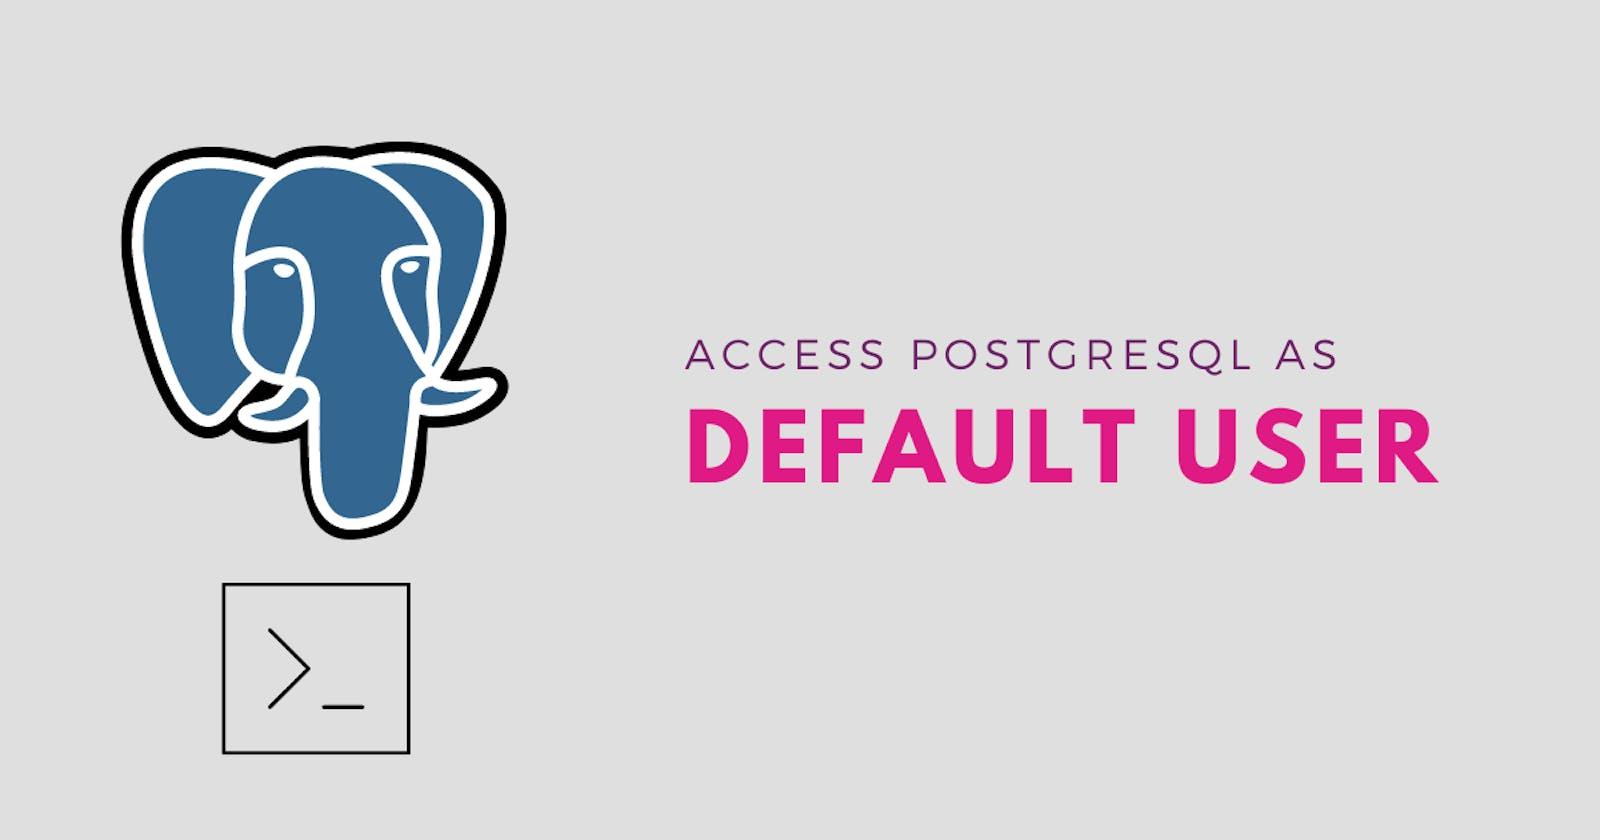 Tutorial: Access Postgresql Database as Default User